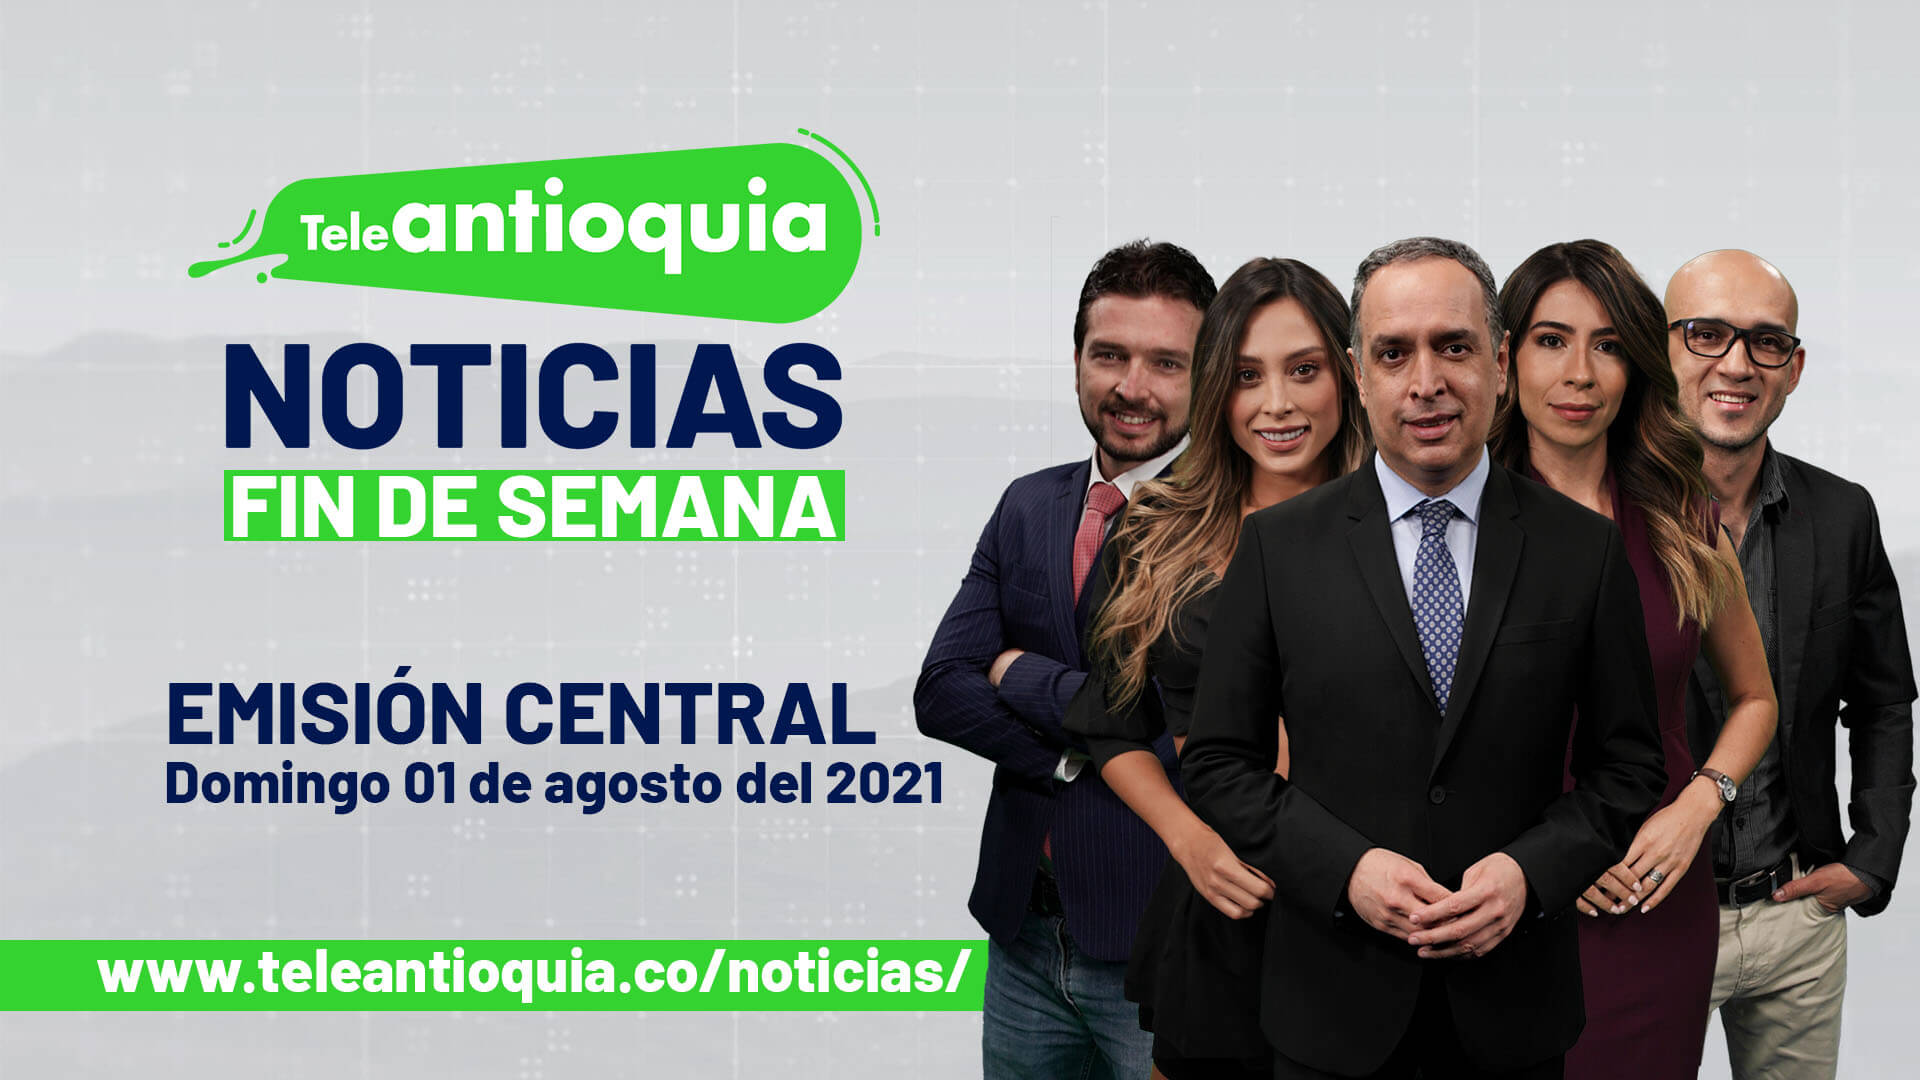 Teleantioquia Noticias – domingo 01 de agosto de 2021 noche